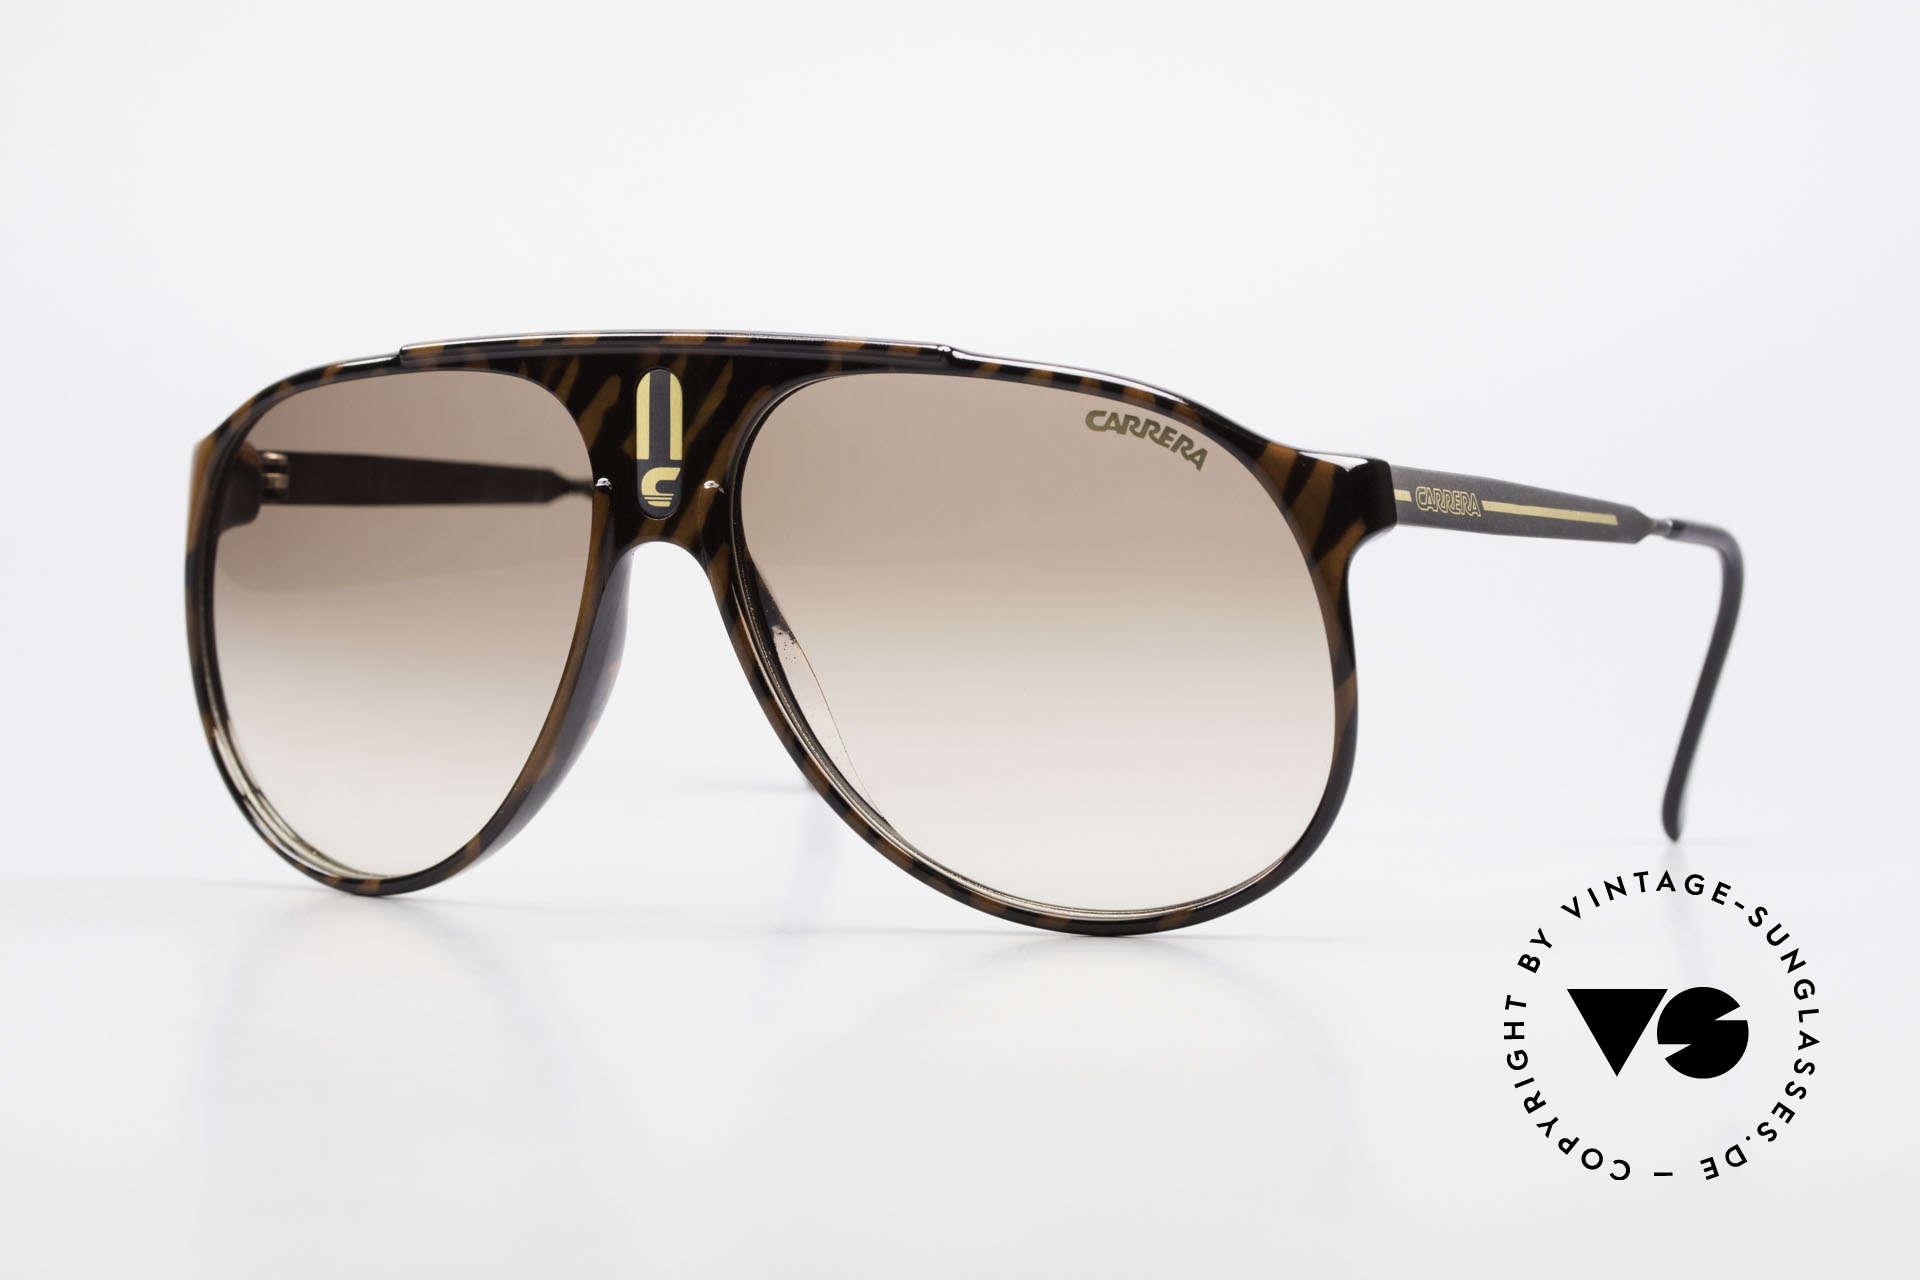 Carrera 5424 Aviator Sports Sunglasses 80's, old 80's sports sunglasses by Carrera; true vintage, Made for Men